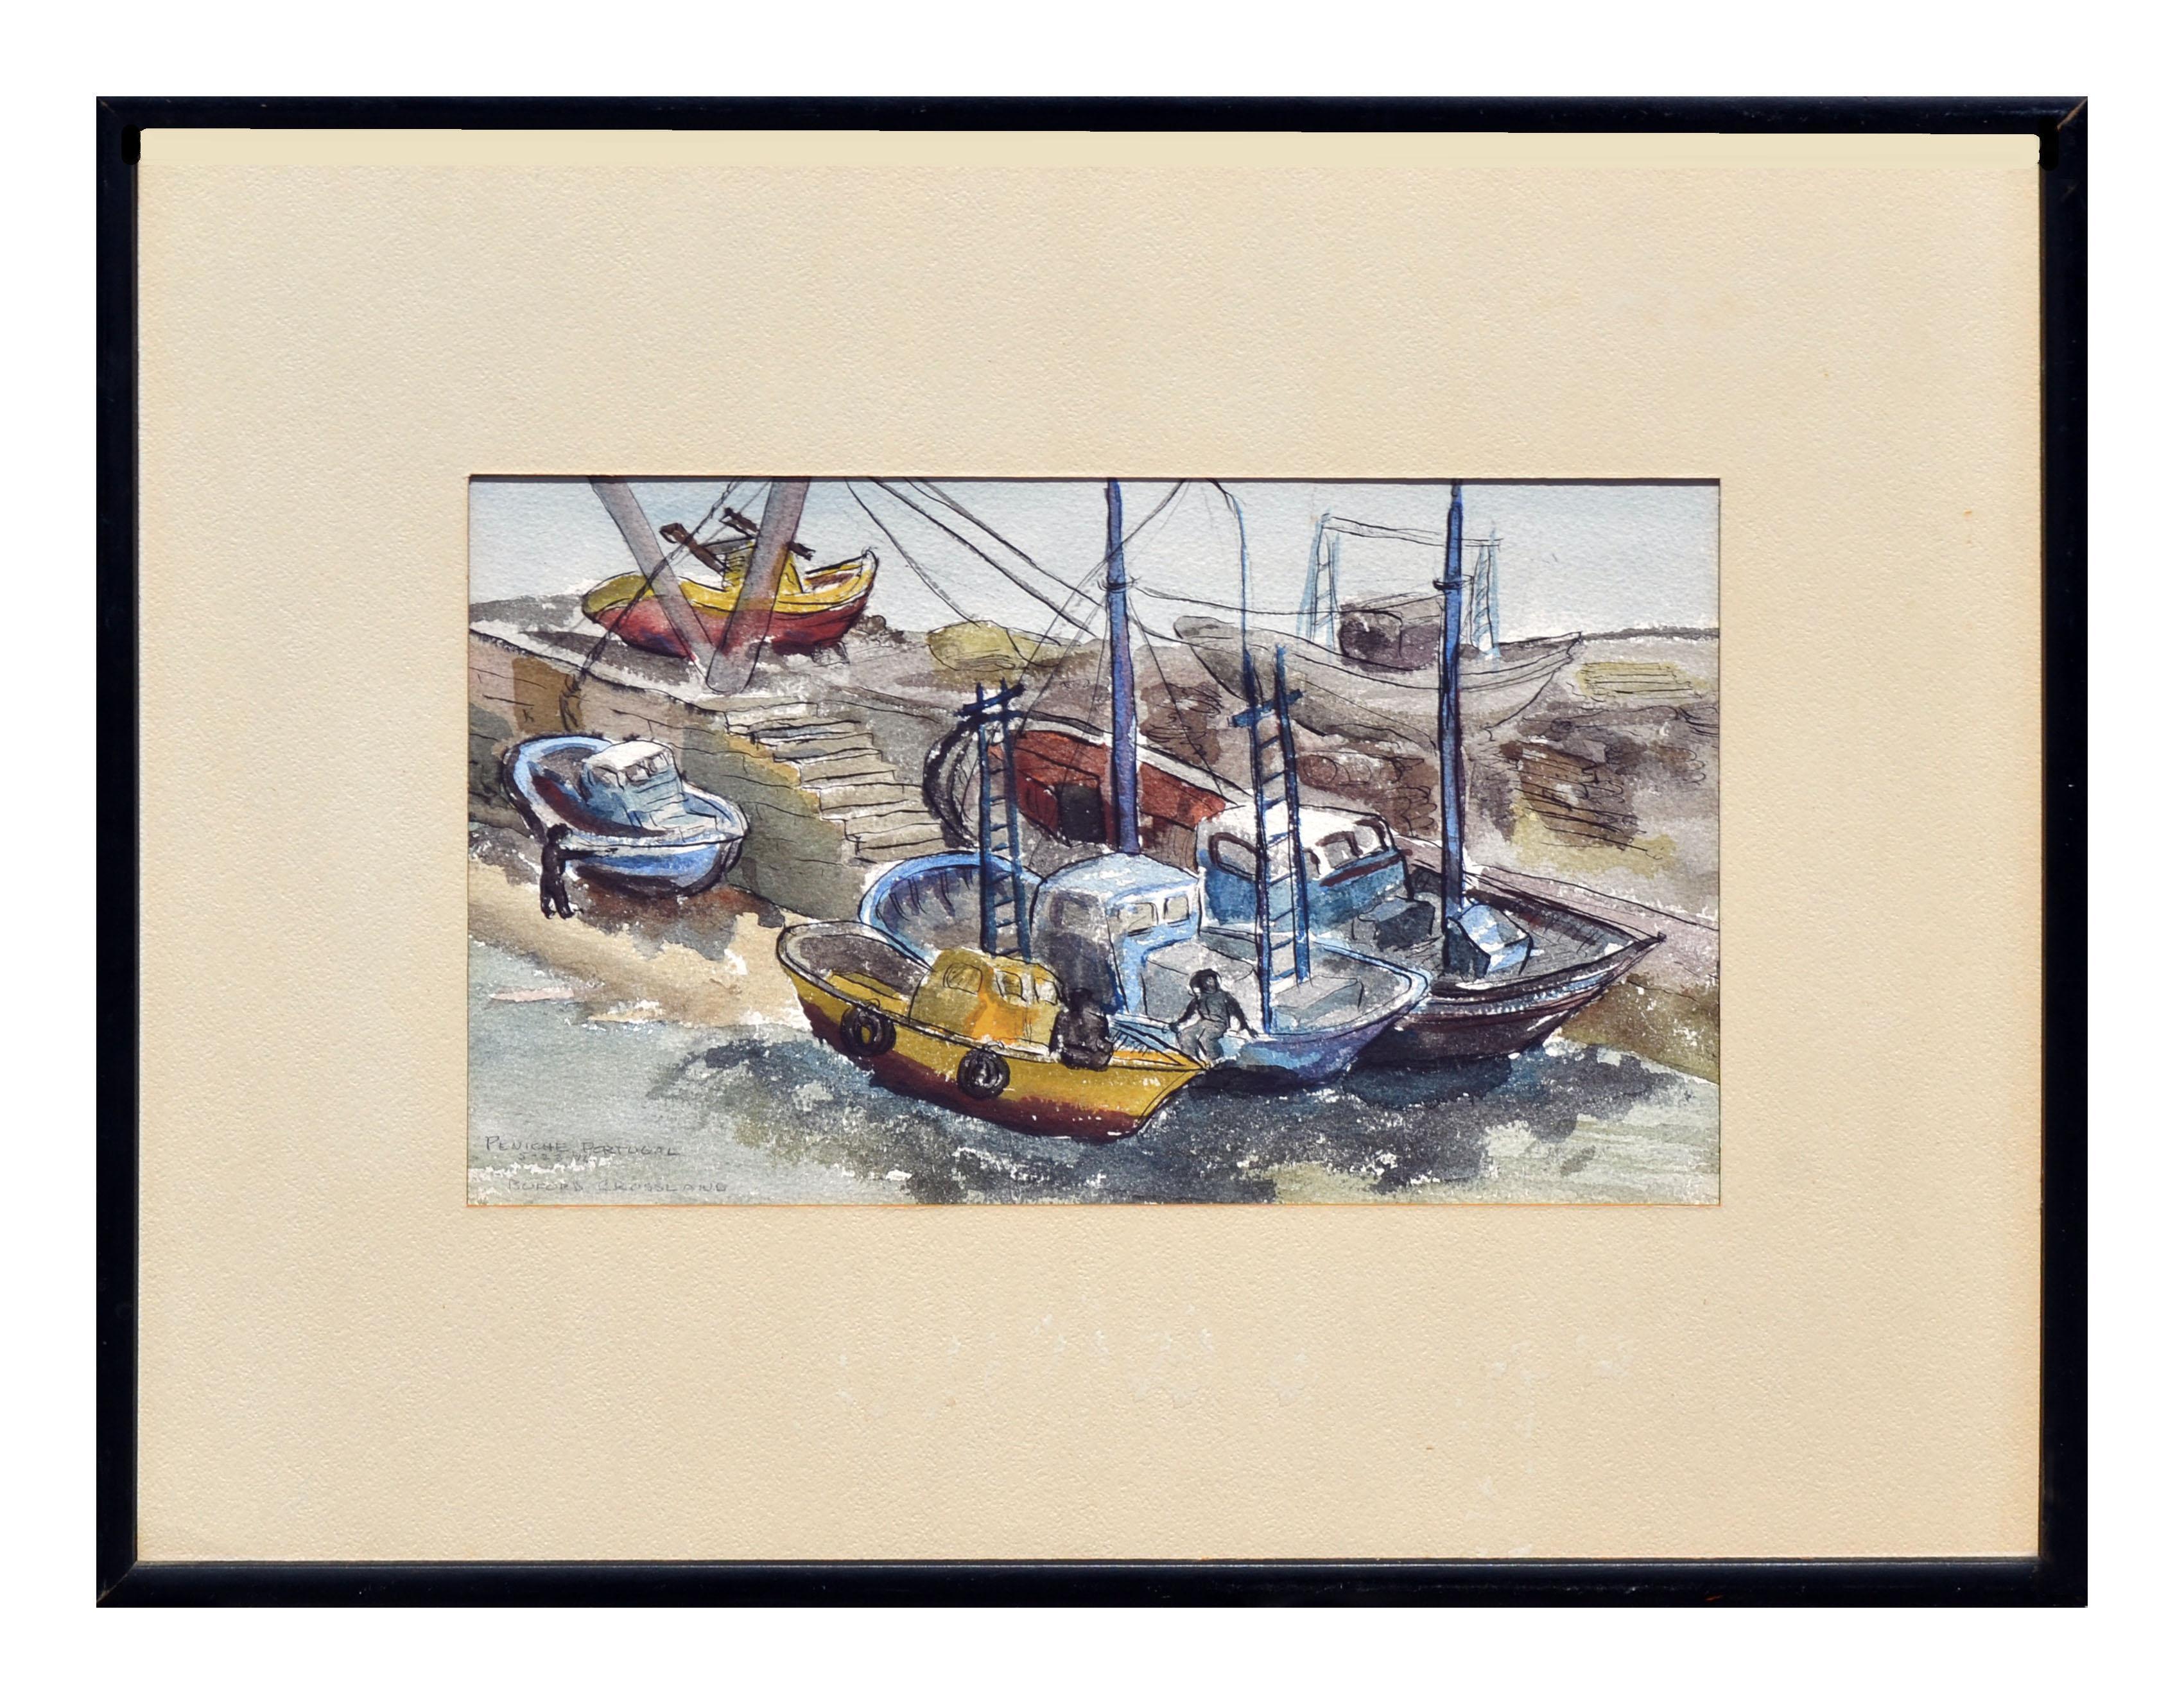 Portugal Harbor - Figurative Landscape with Boats